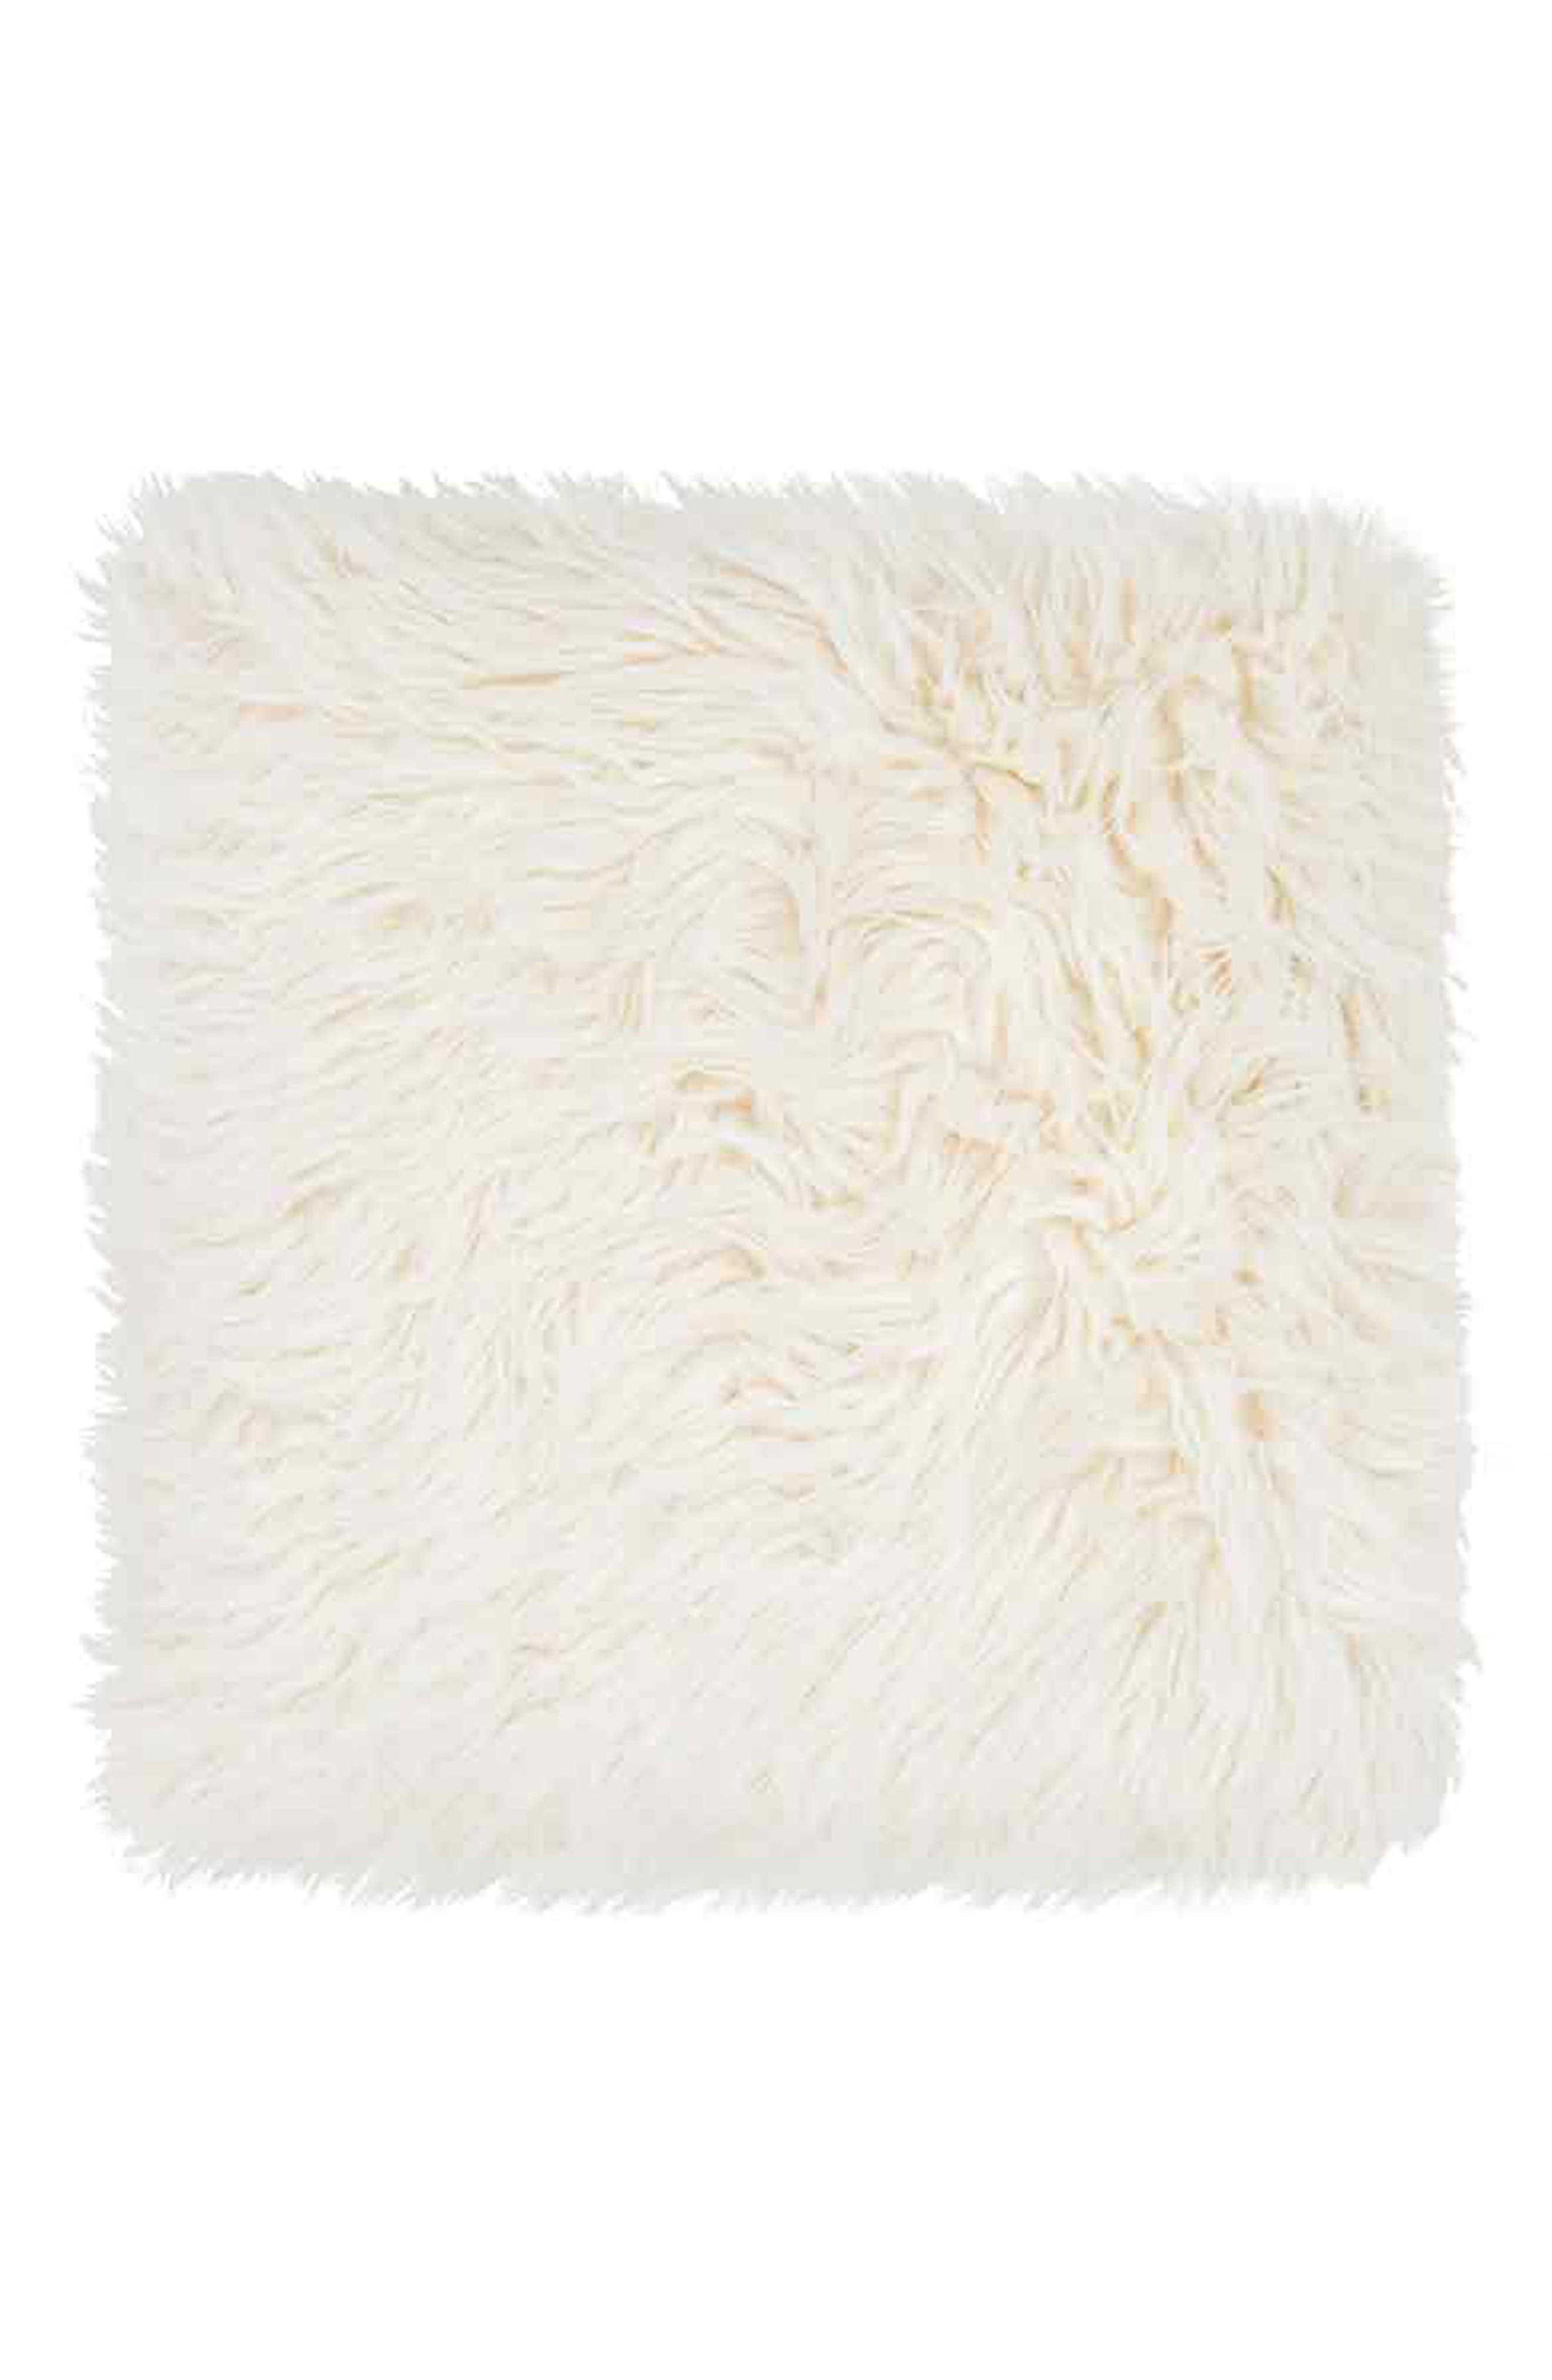 Heron Faux Fur Accent Pillow,                             Main thumbnail 1, color,                             WHISPER WHITE/ WHISPER WHITE